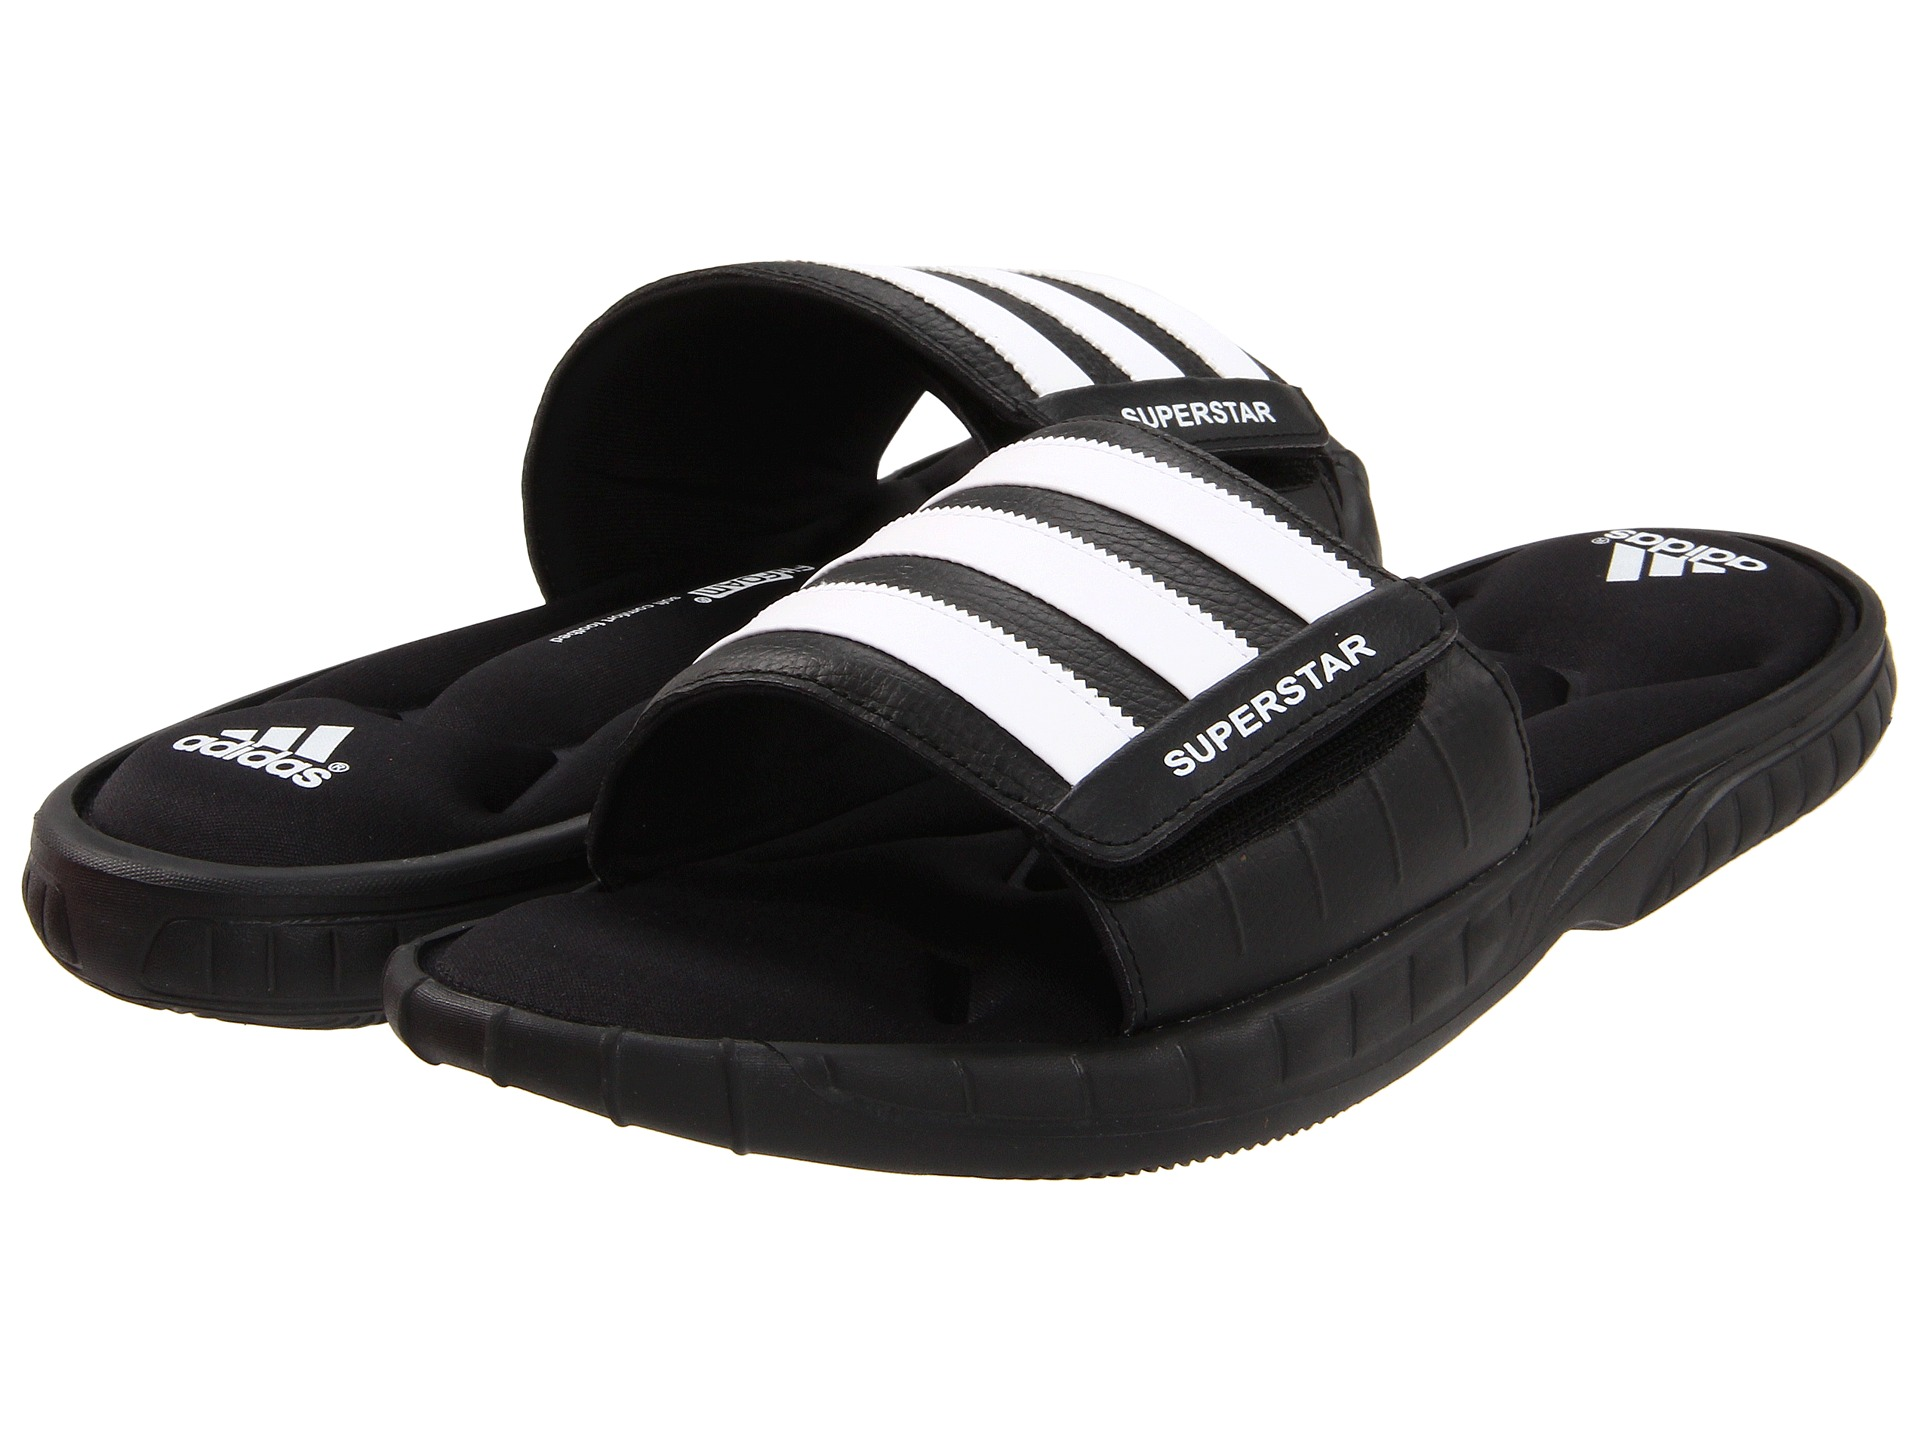 adidas Superstar 3G Slide White Black Black on PopScreen d17d750c4